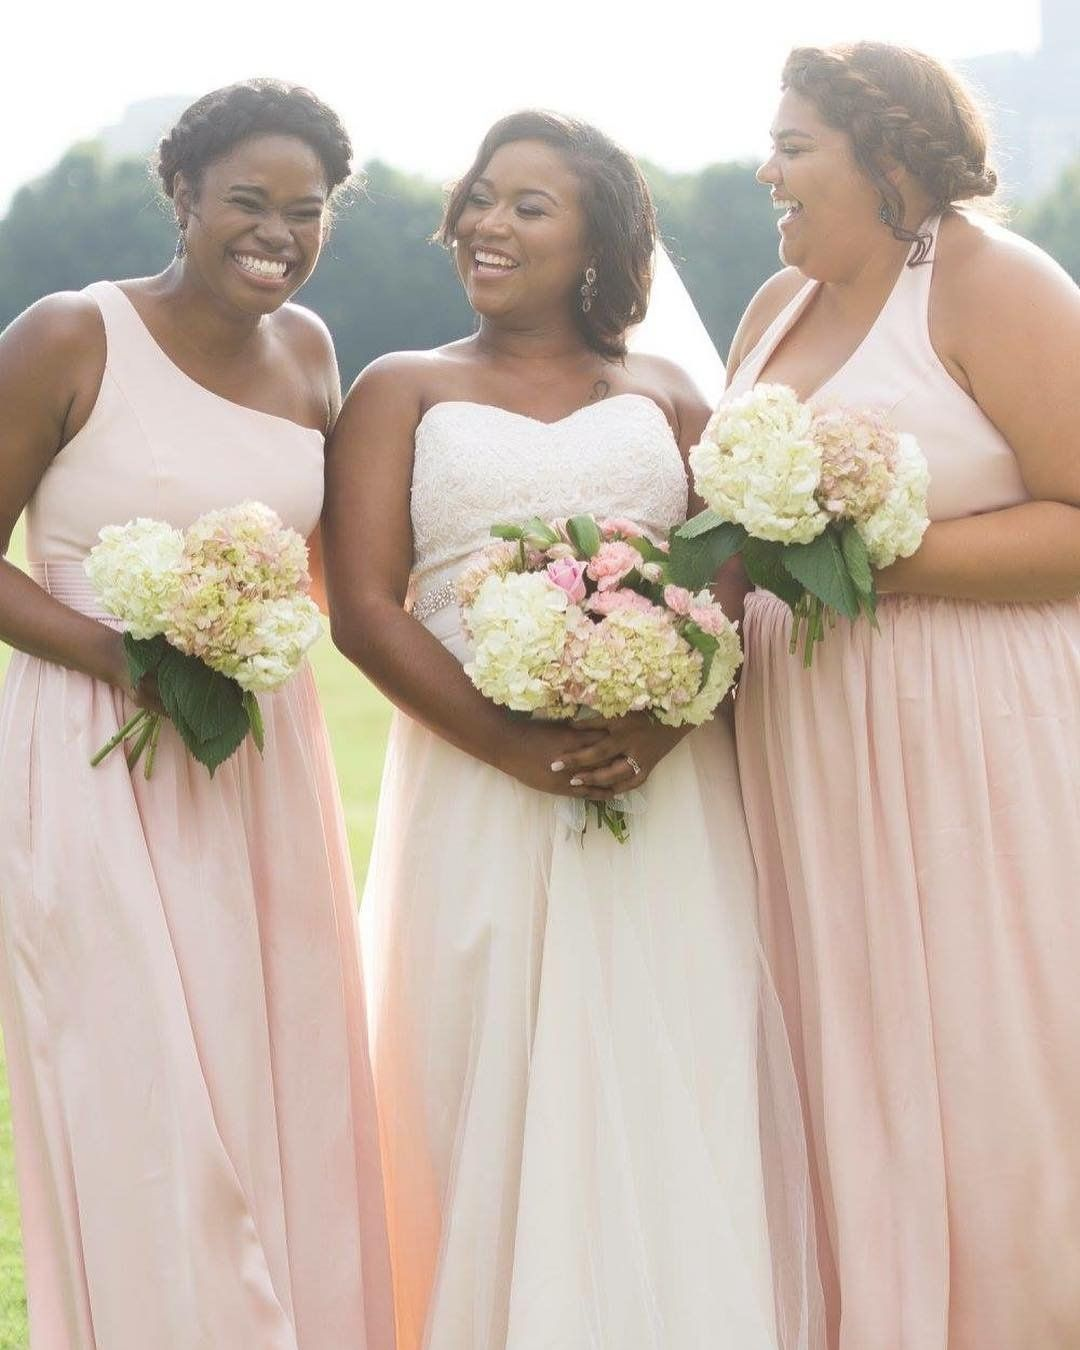 Shivaun elizabeths bridesmaids in blush one shoulder and v neck shivaun elizabeths bridesmaids in blush one shoulder and v neck long bridesmaid dresses by white ombrellifo Images